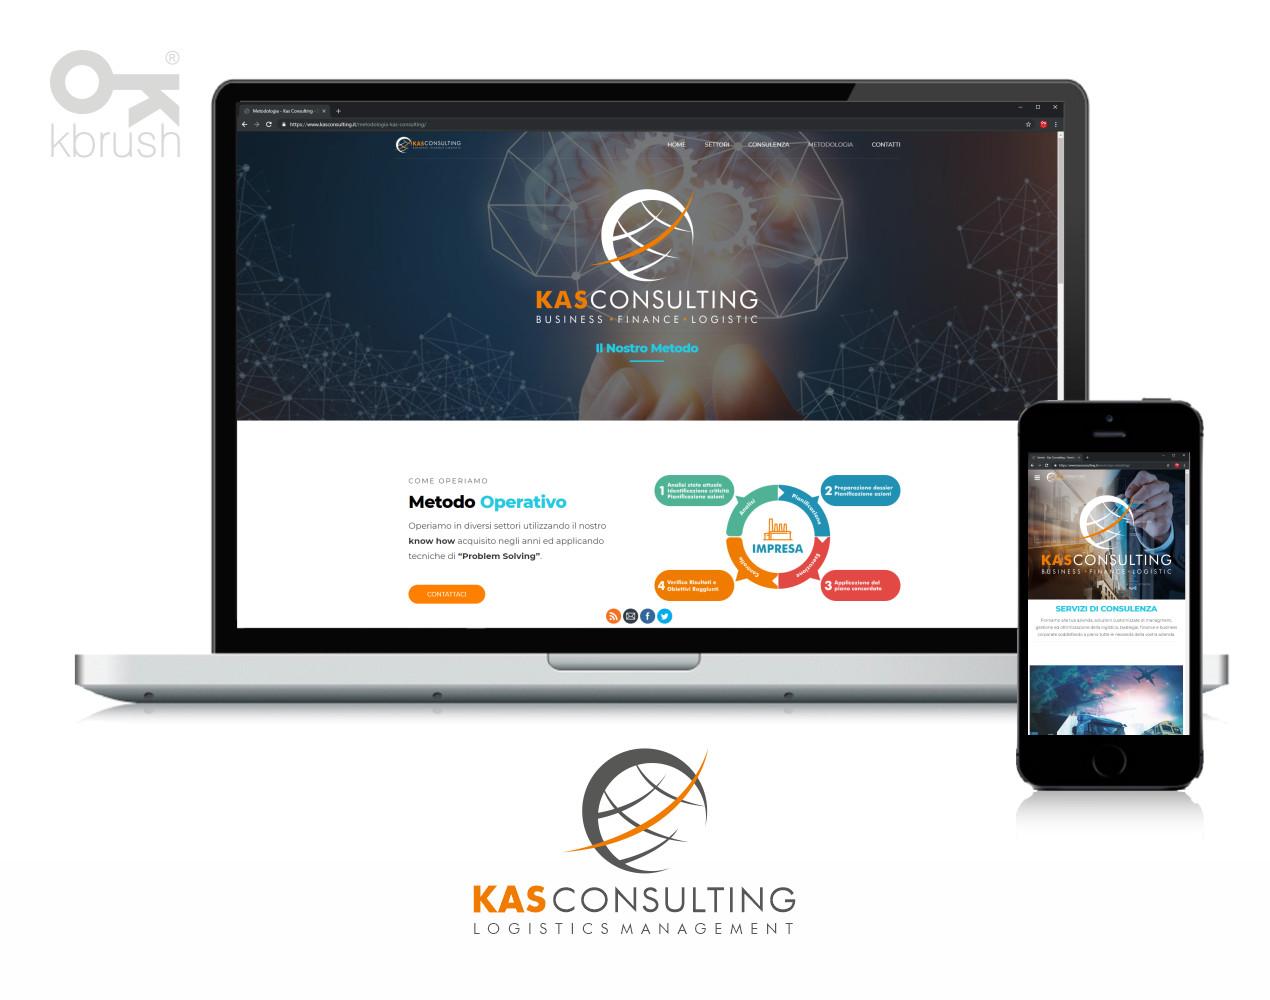 sito web Kas consulting – Kbrush Studio grafico